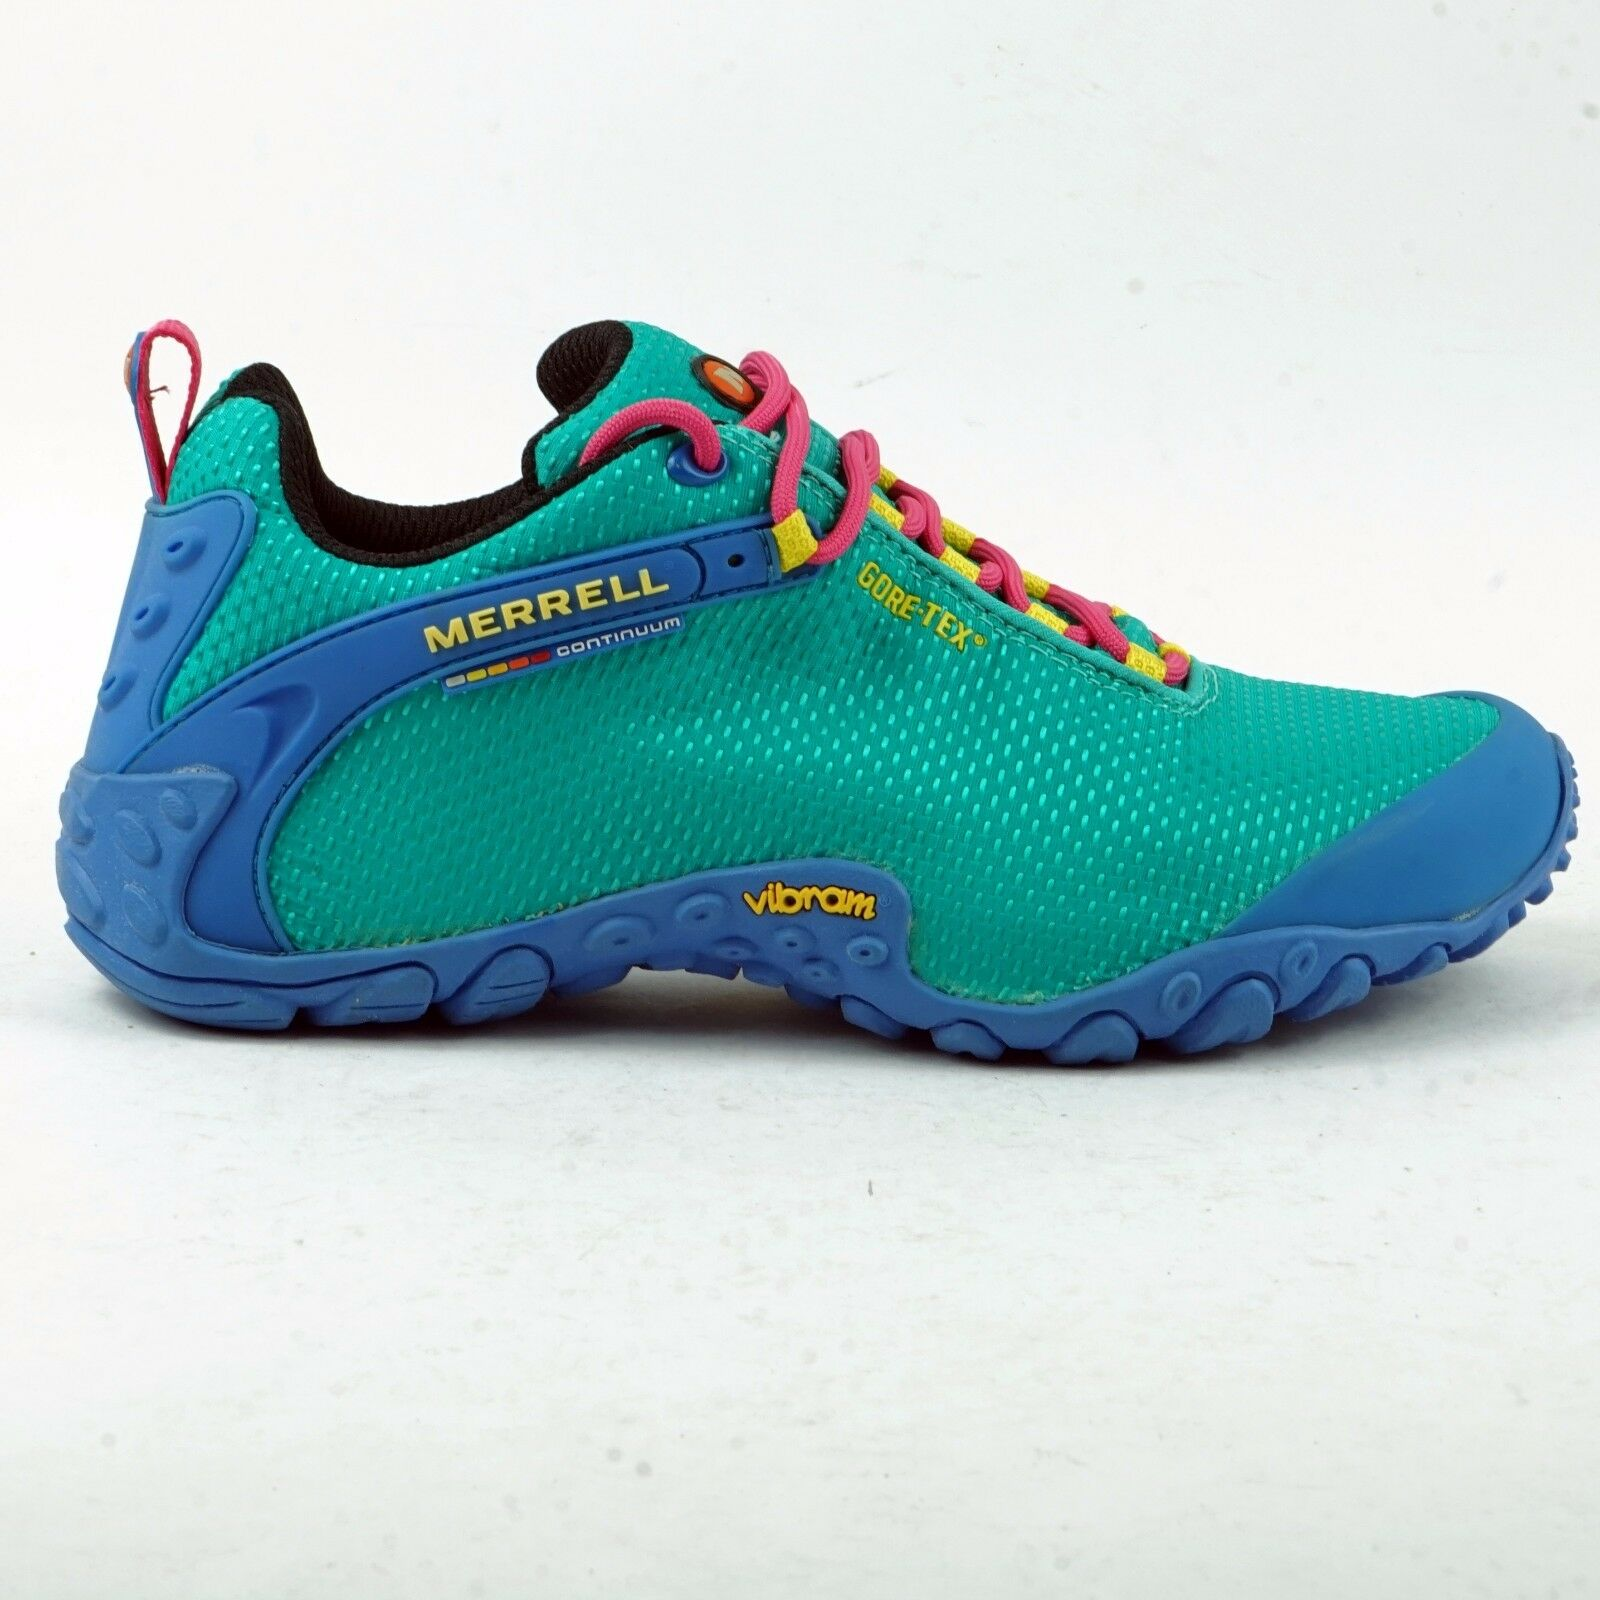 Merrell Para Mujer Chameleon 2 Storm Gore-tex Outdoors ruta de senderismo Zapatos